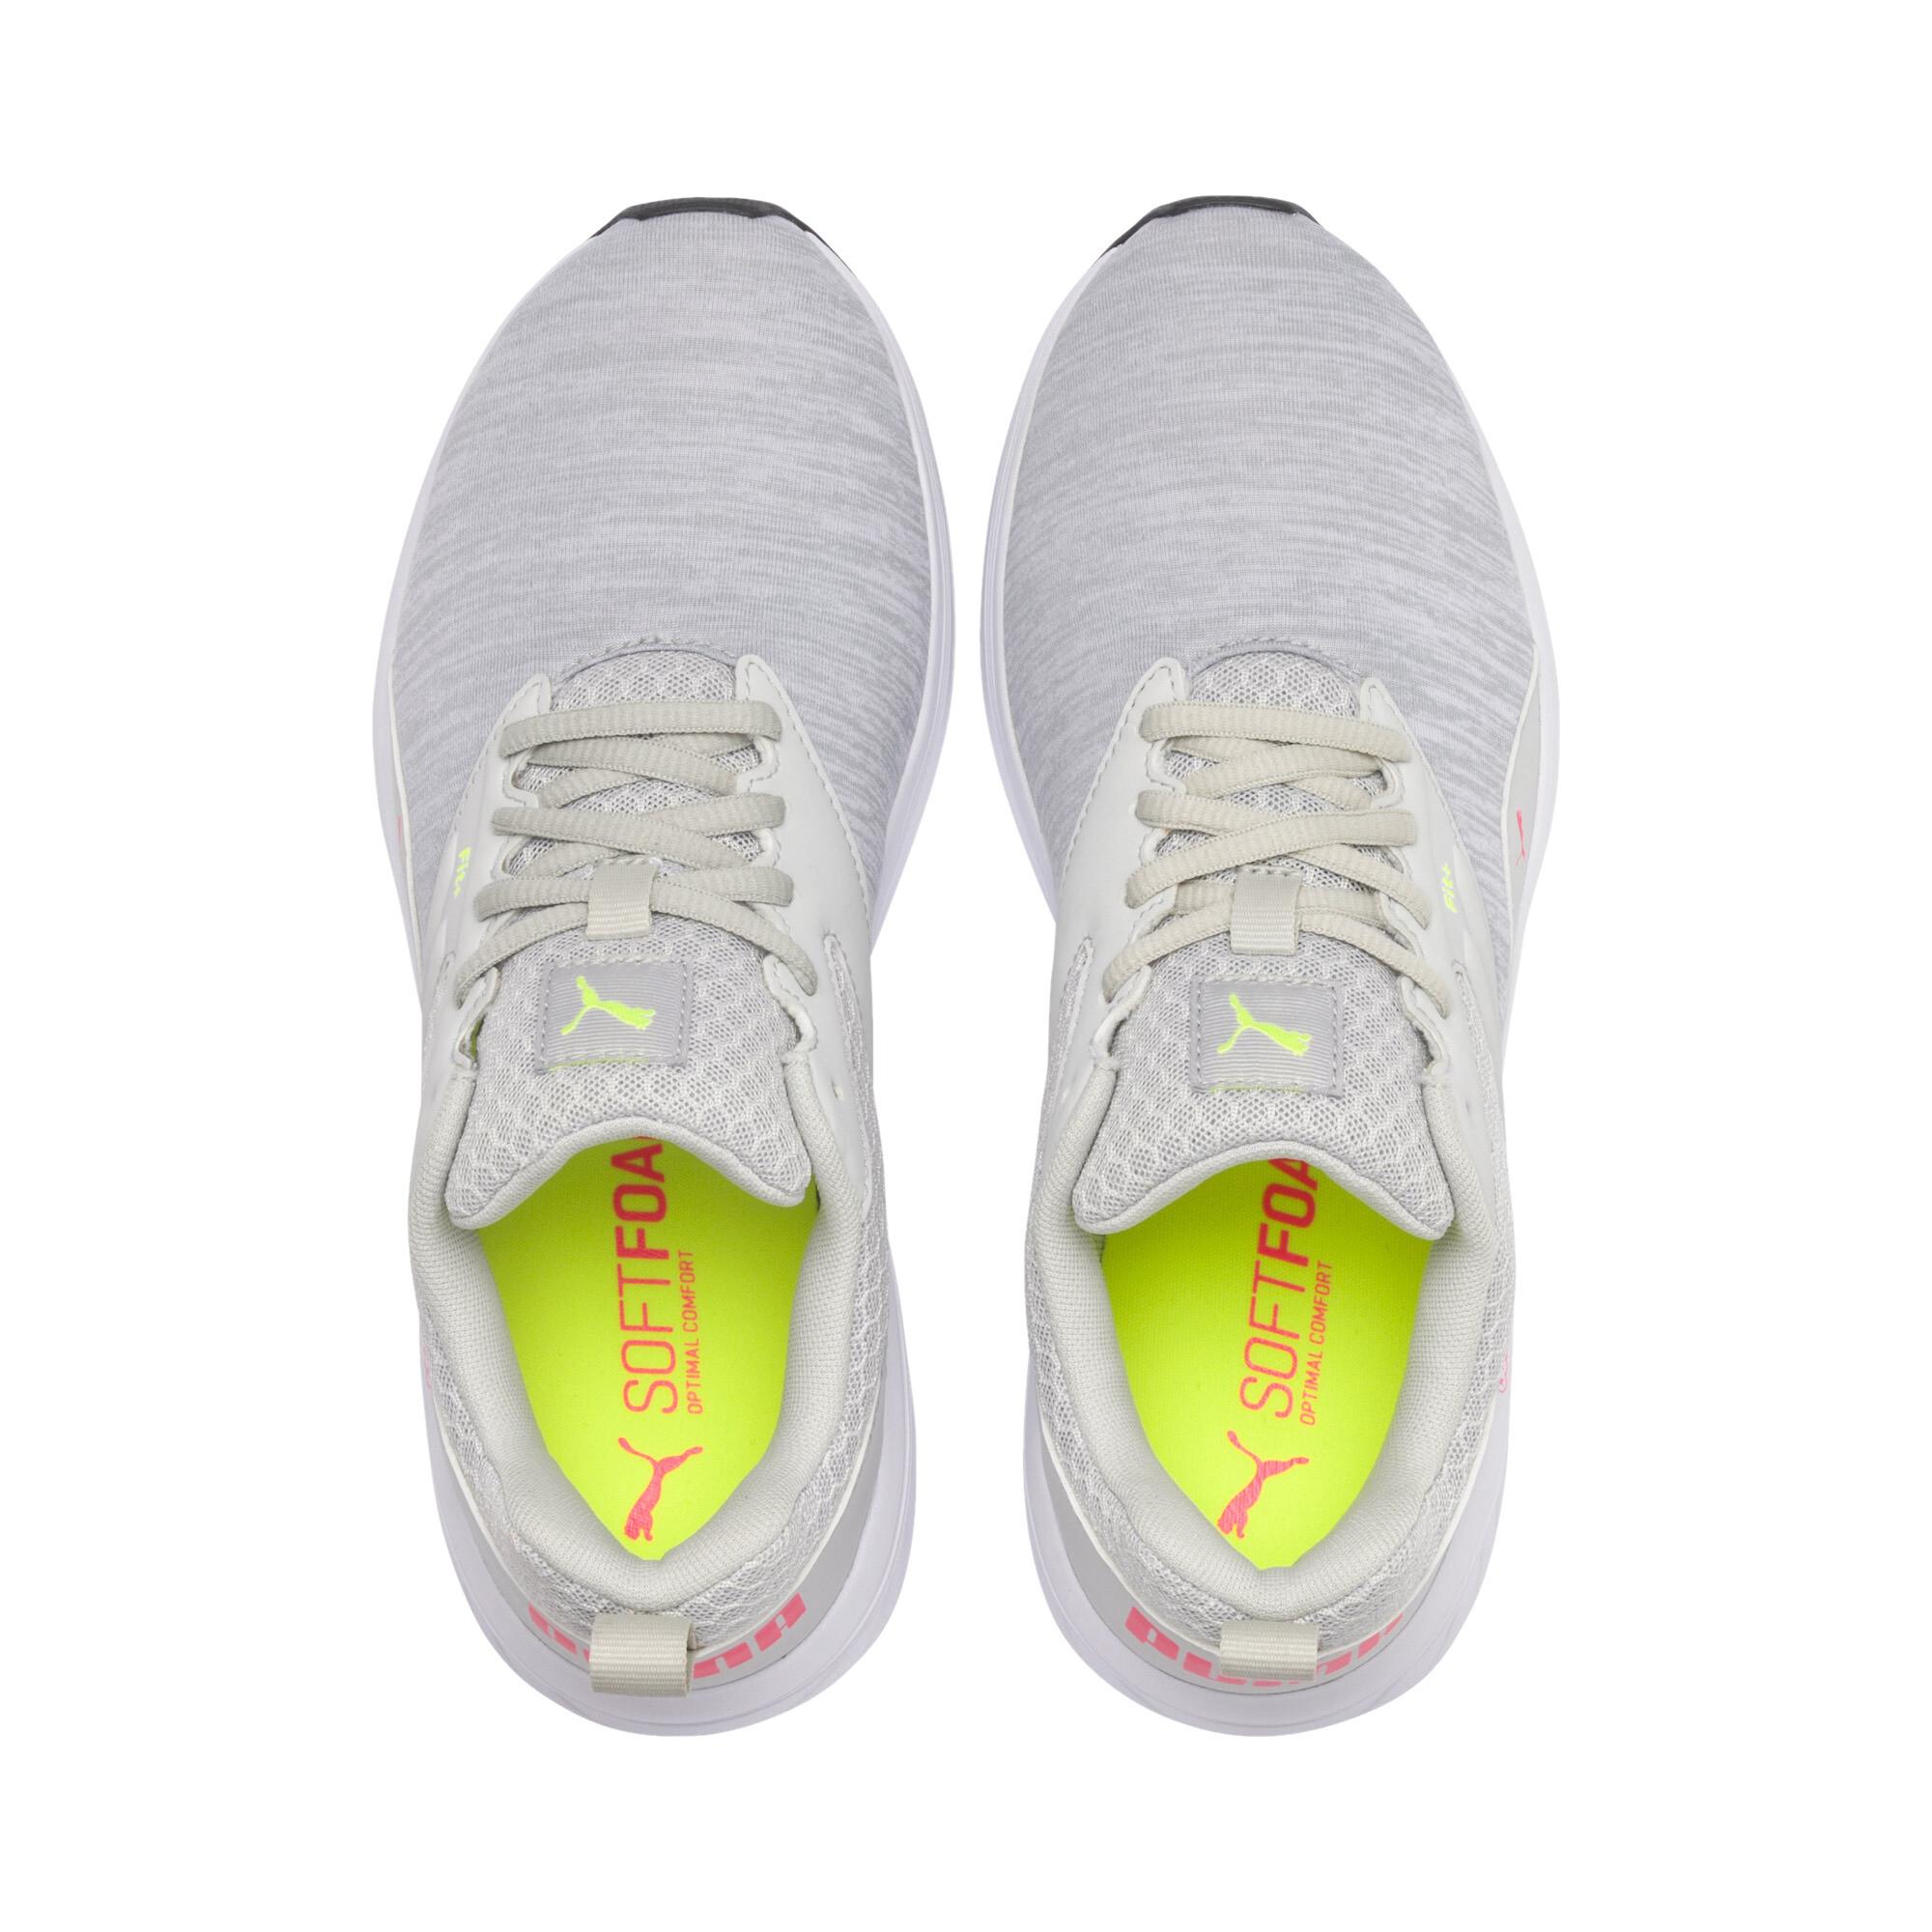 PUMA-NRGY-Comet-Men-039-s-Running-Shoes-Men-Shoe-Running thumbnail 27